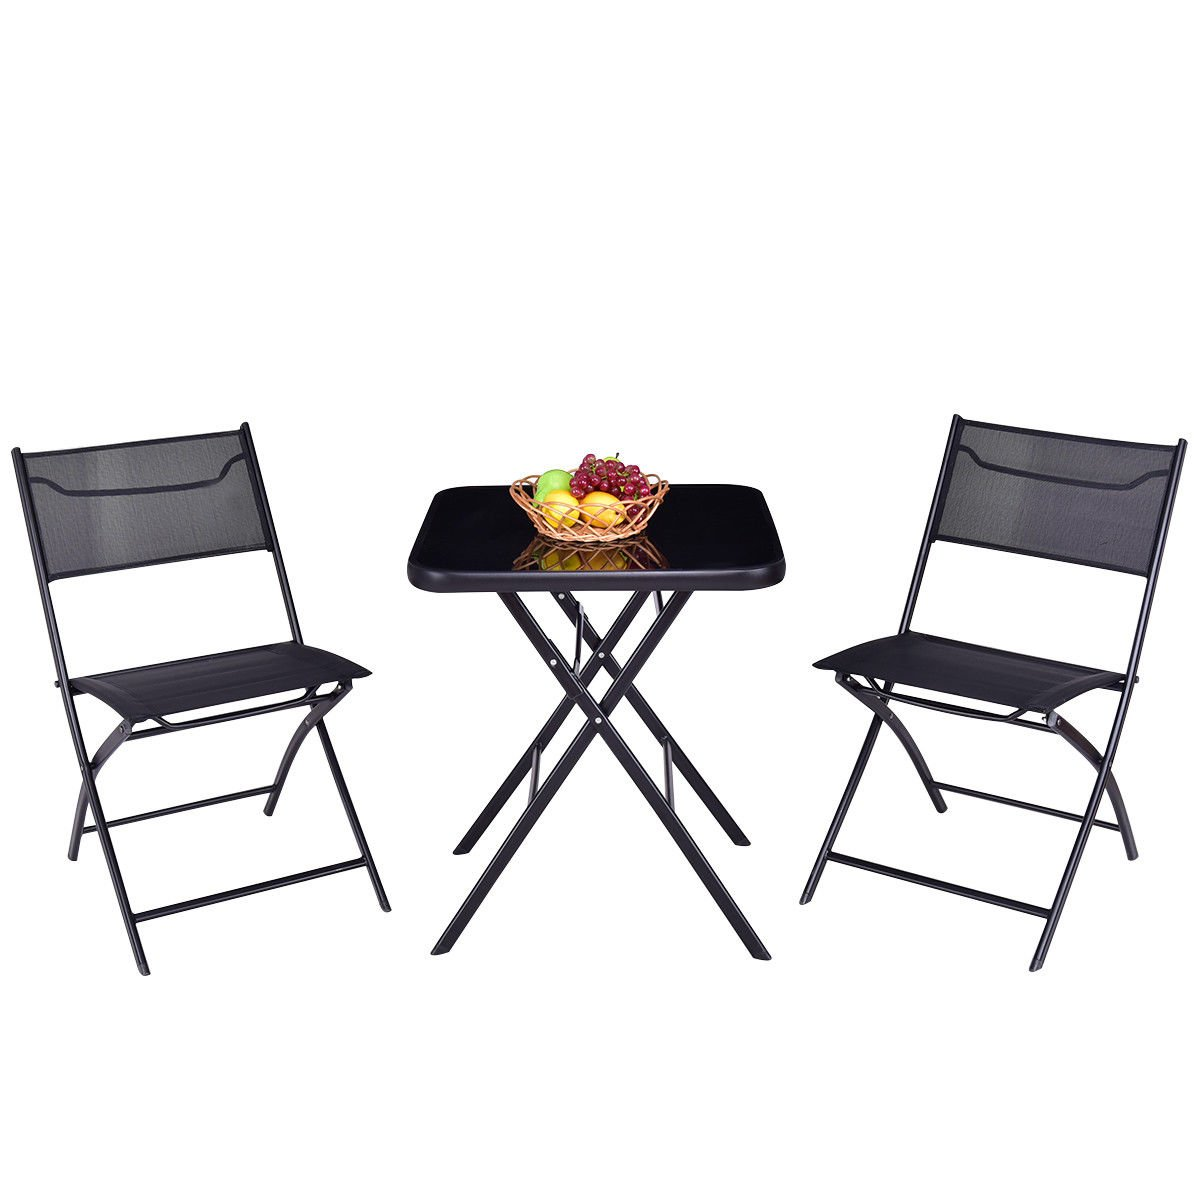 Good concept 3 pc Outdoor Patio Folding Square Table Chair Suit Set Bistro Backyard Yard Garden